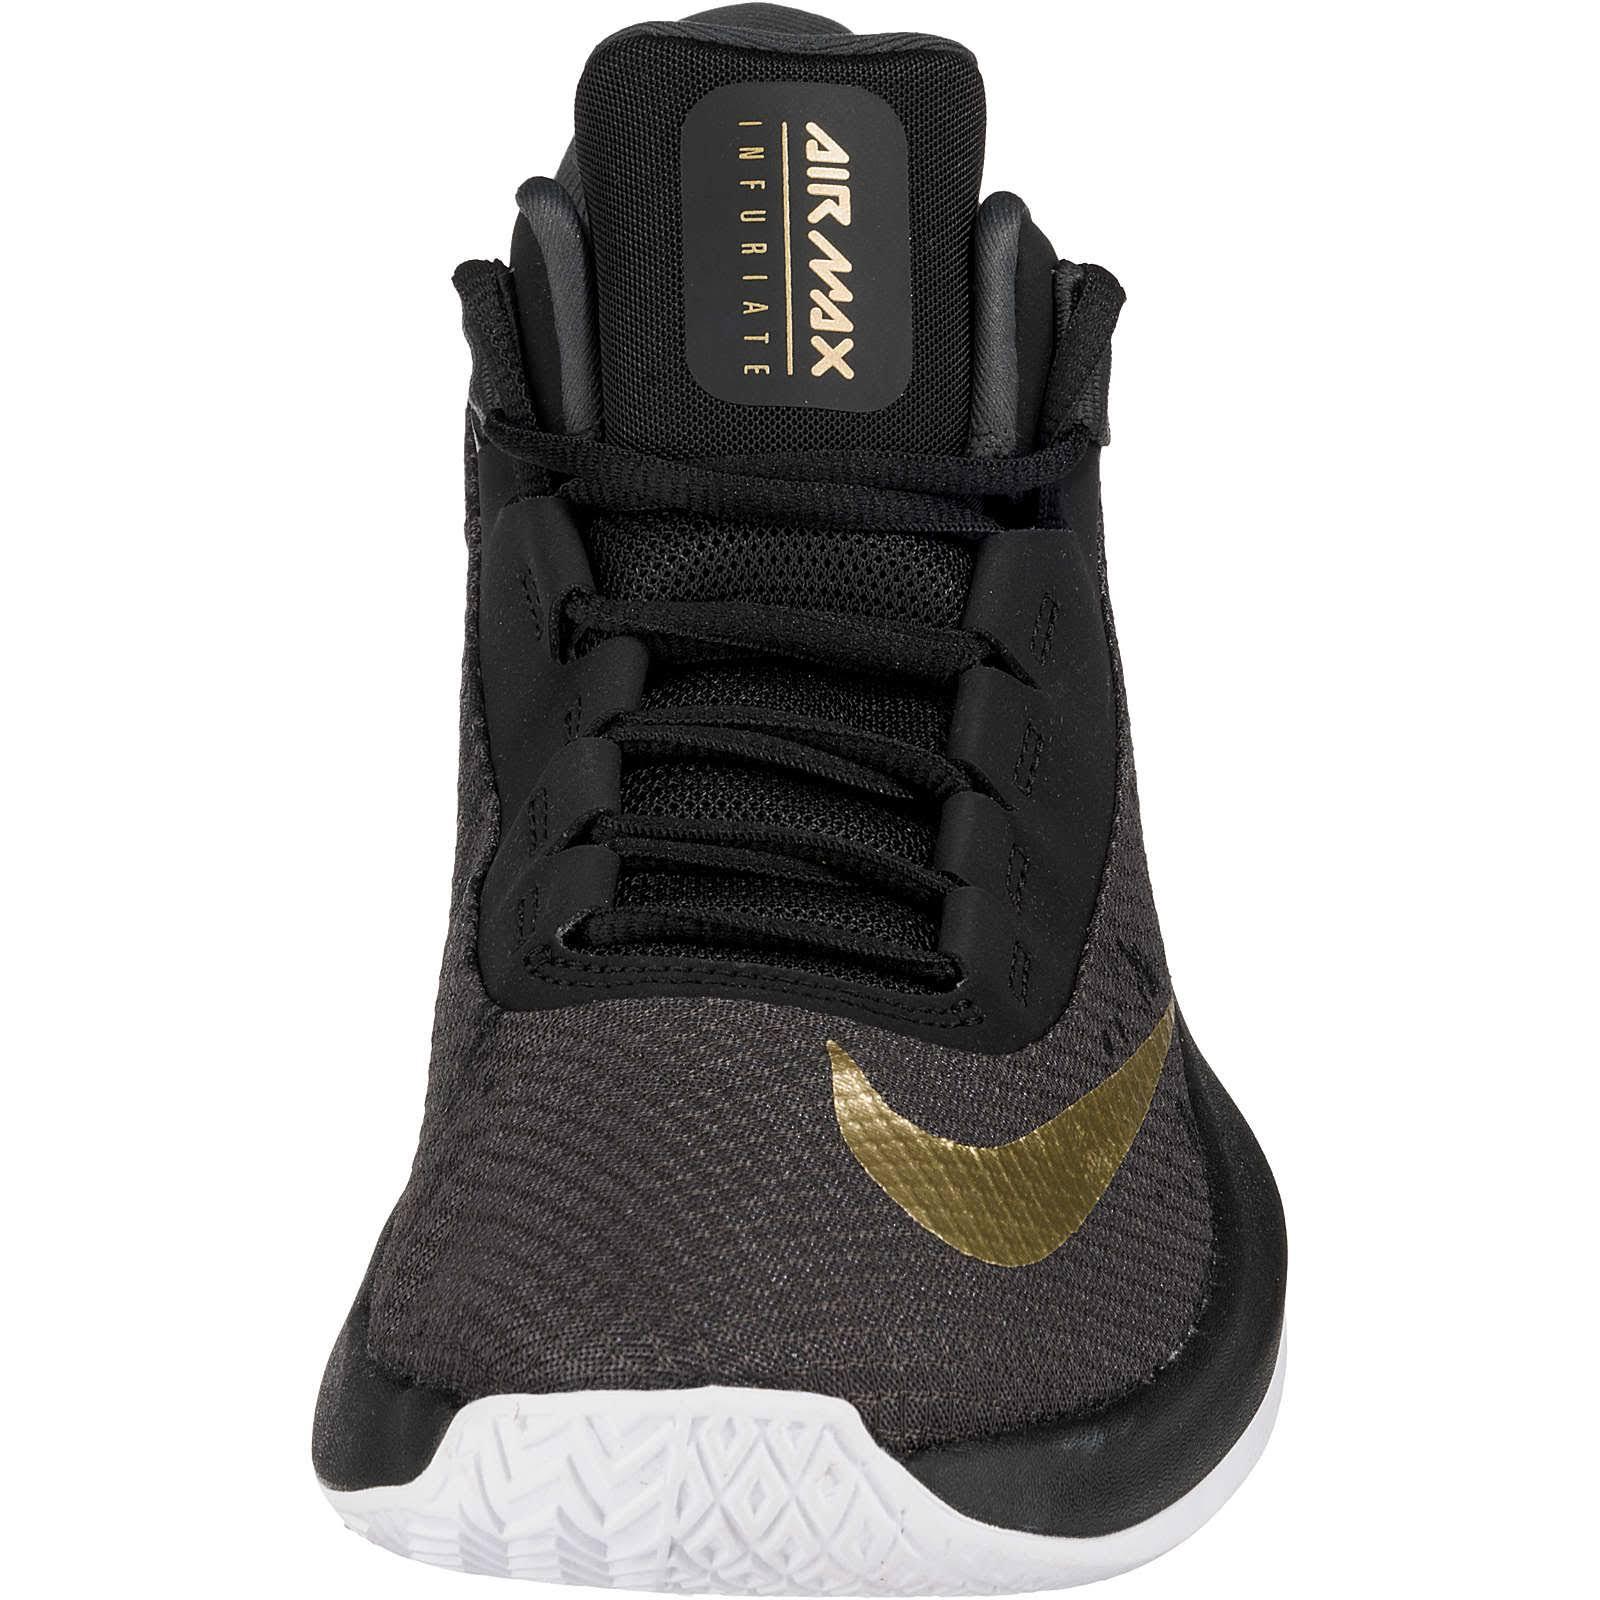 44 Nike Anthrazit 10 Air us 2 Max Basketball Mid Infuriate X1nXBrqvw